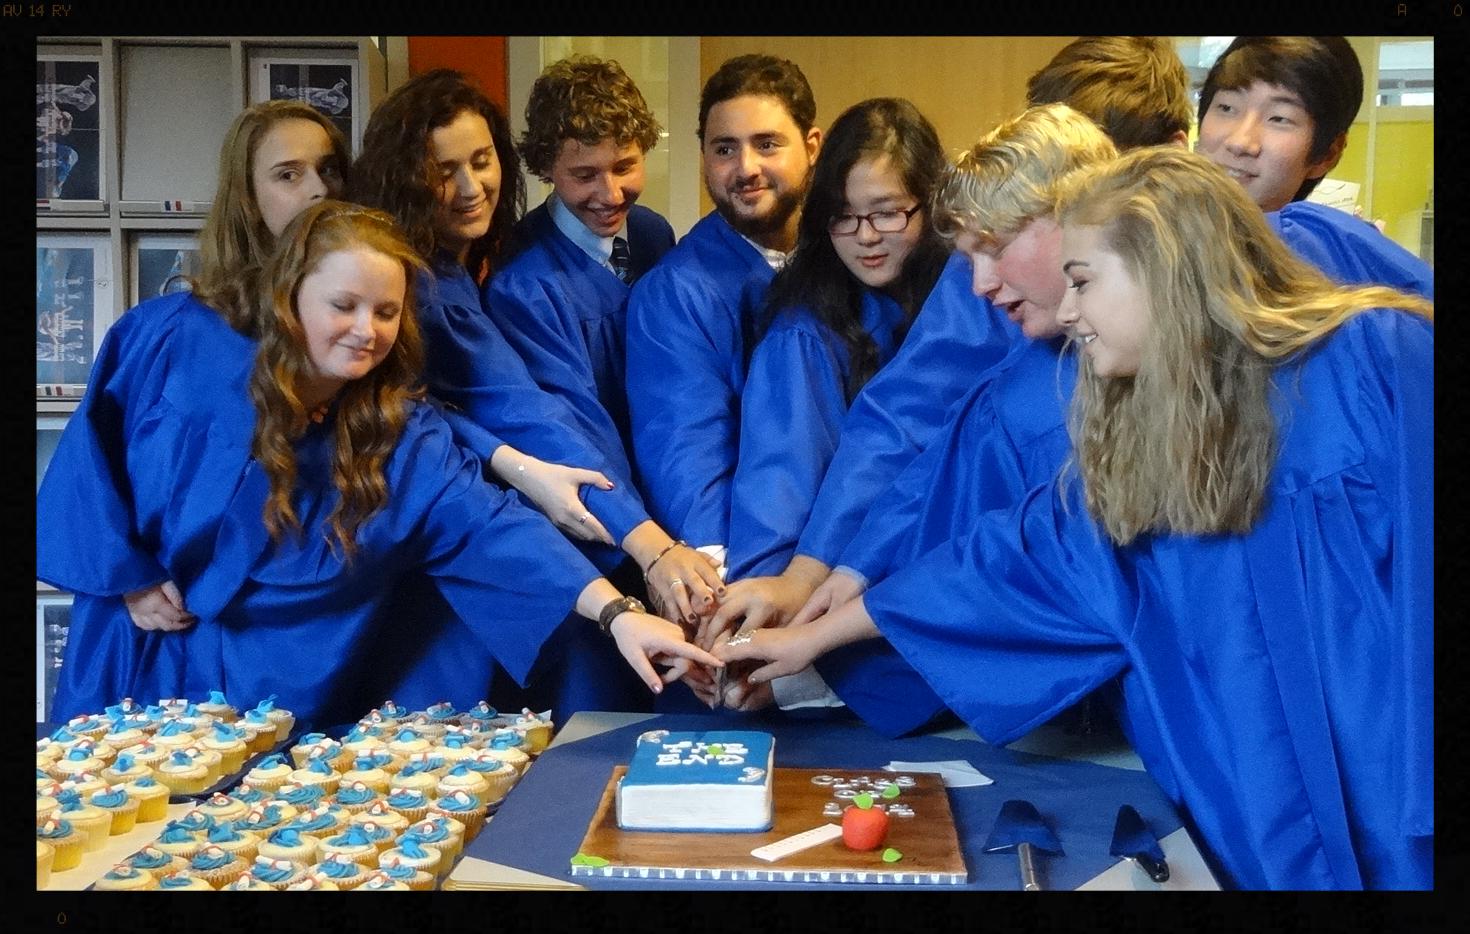 The seniors preparing to cut the cake.